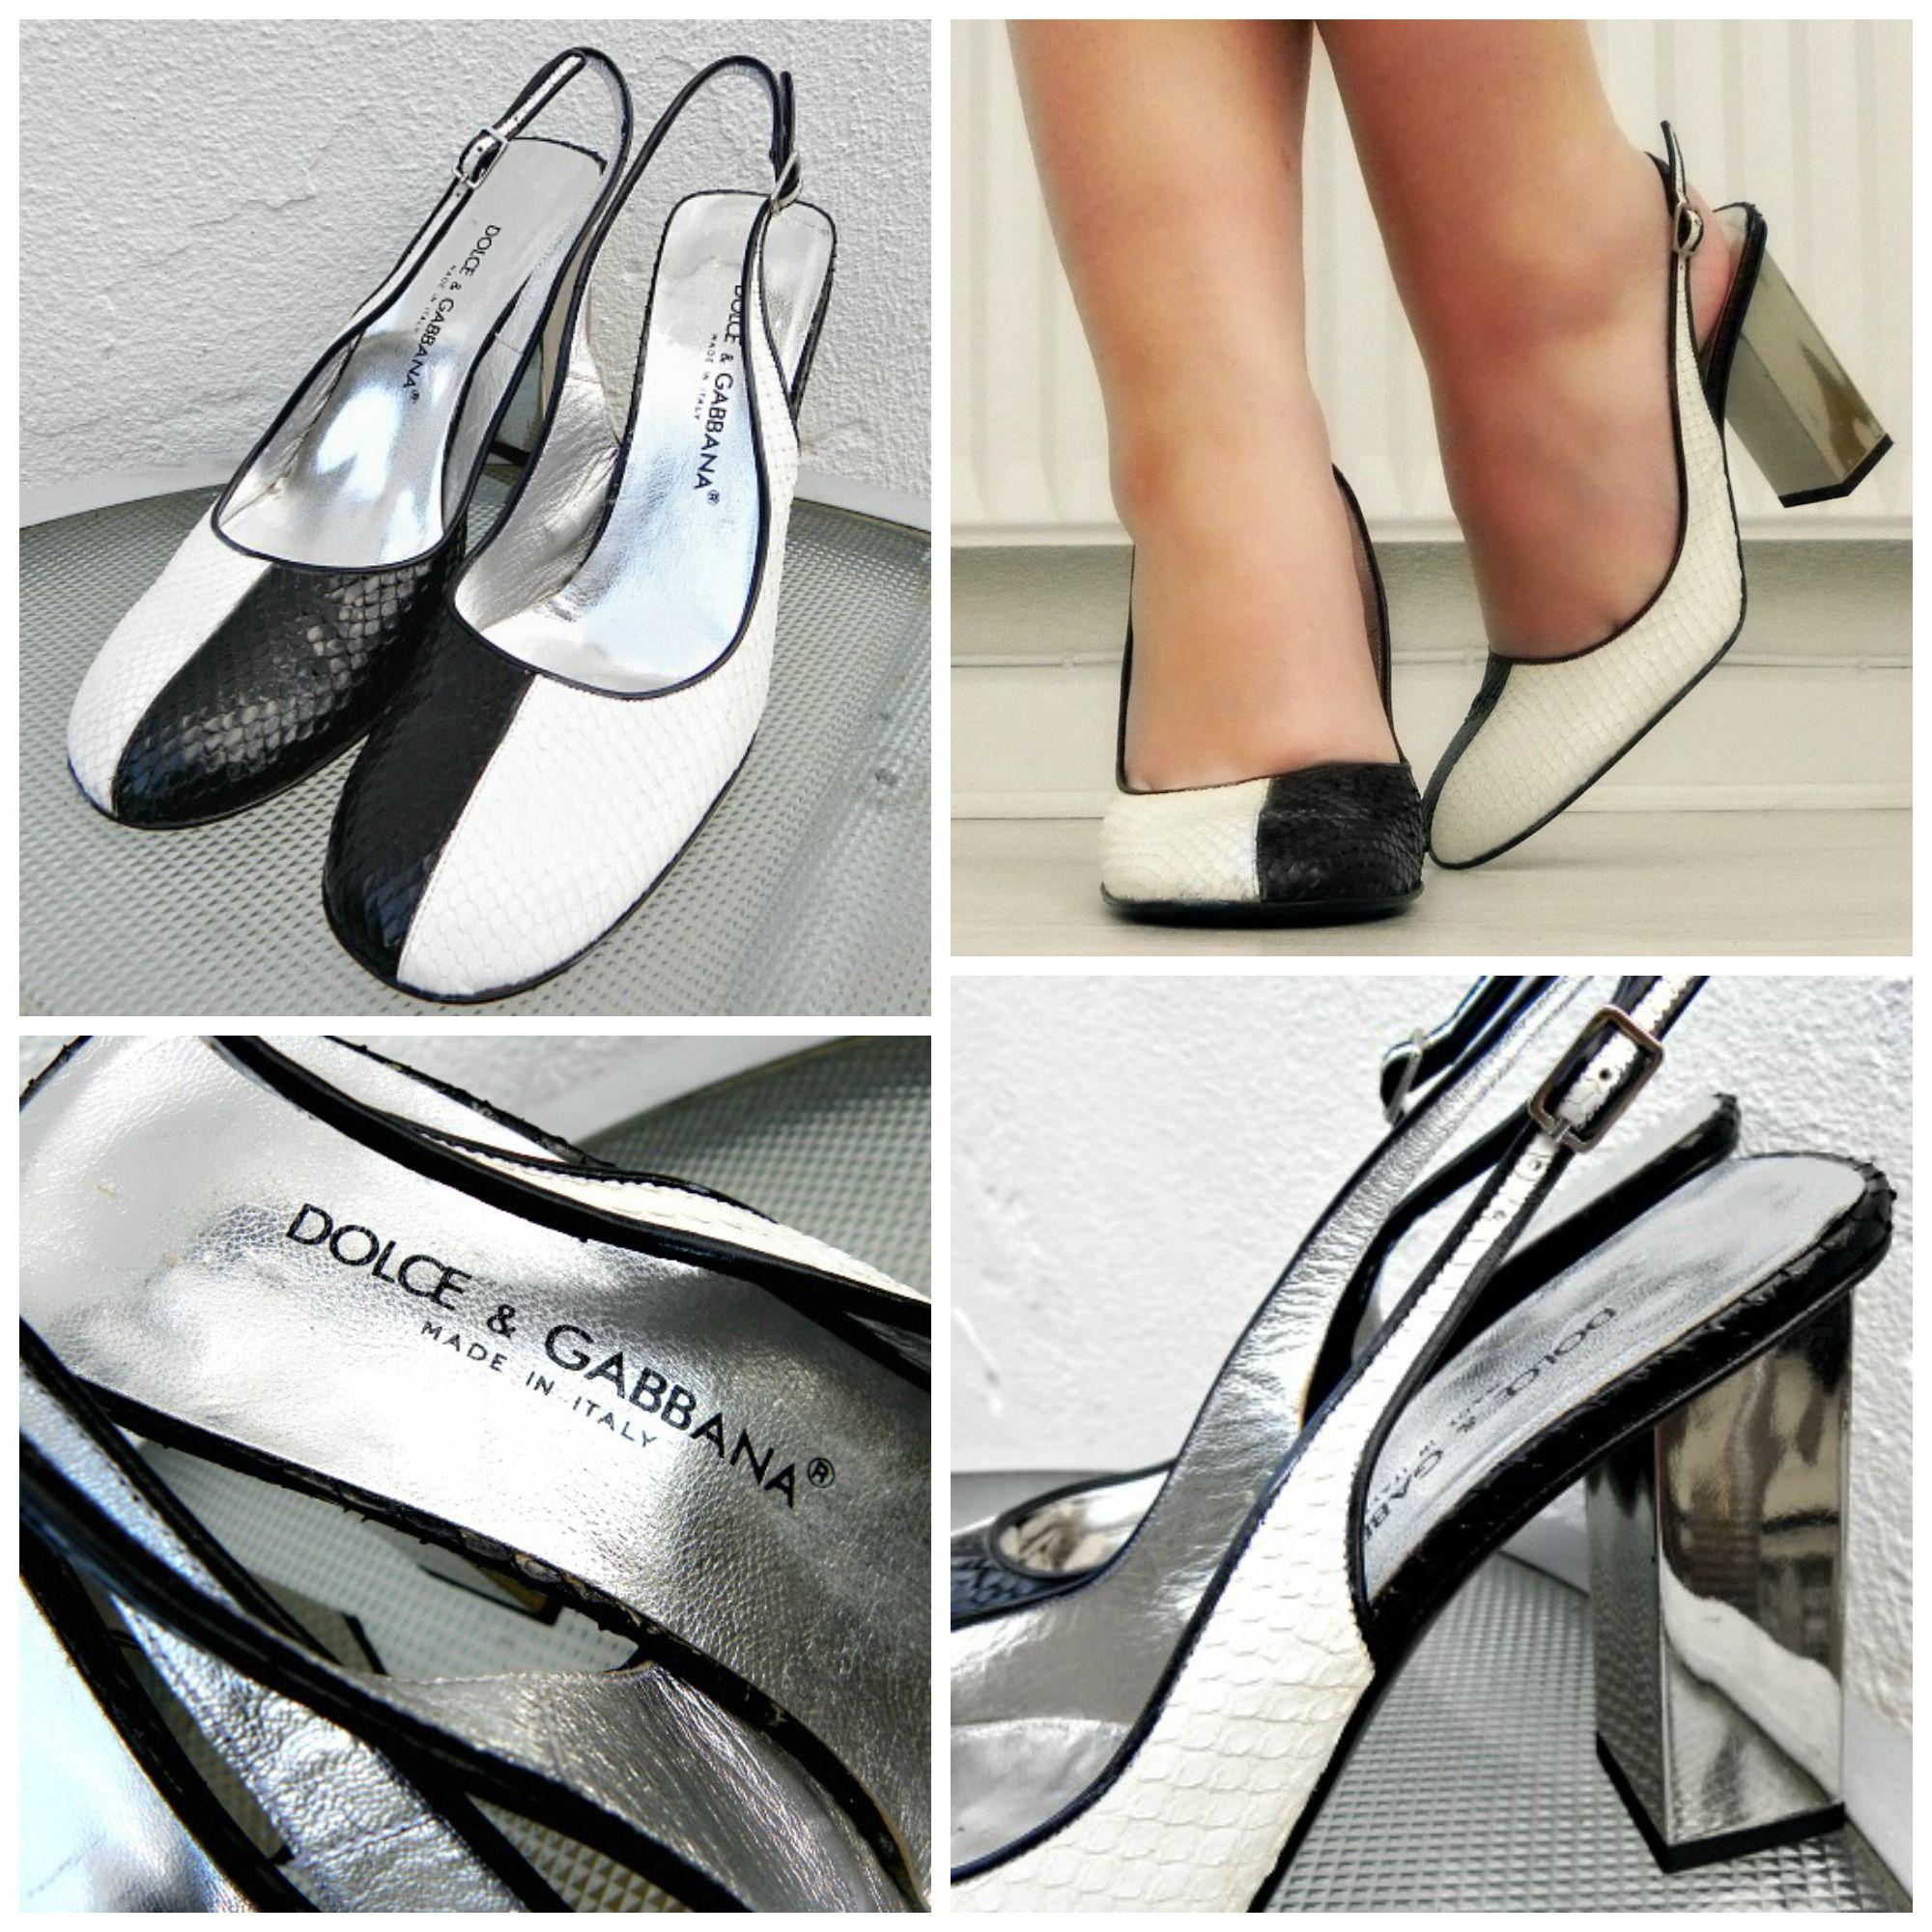 Vintage 90s Dolce & Gabbana Black & White snakeskin shoes with silver mirror block heel www.desdemonastyle.wordpress.com